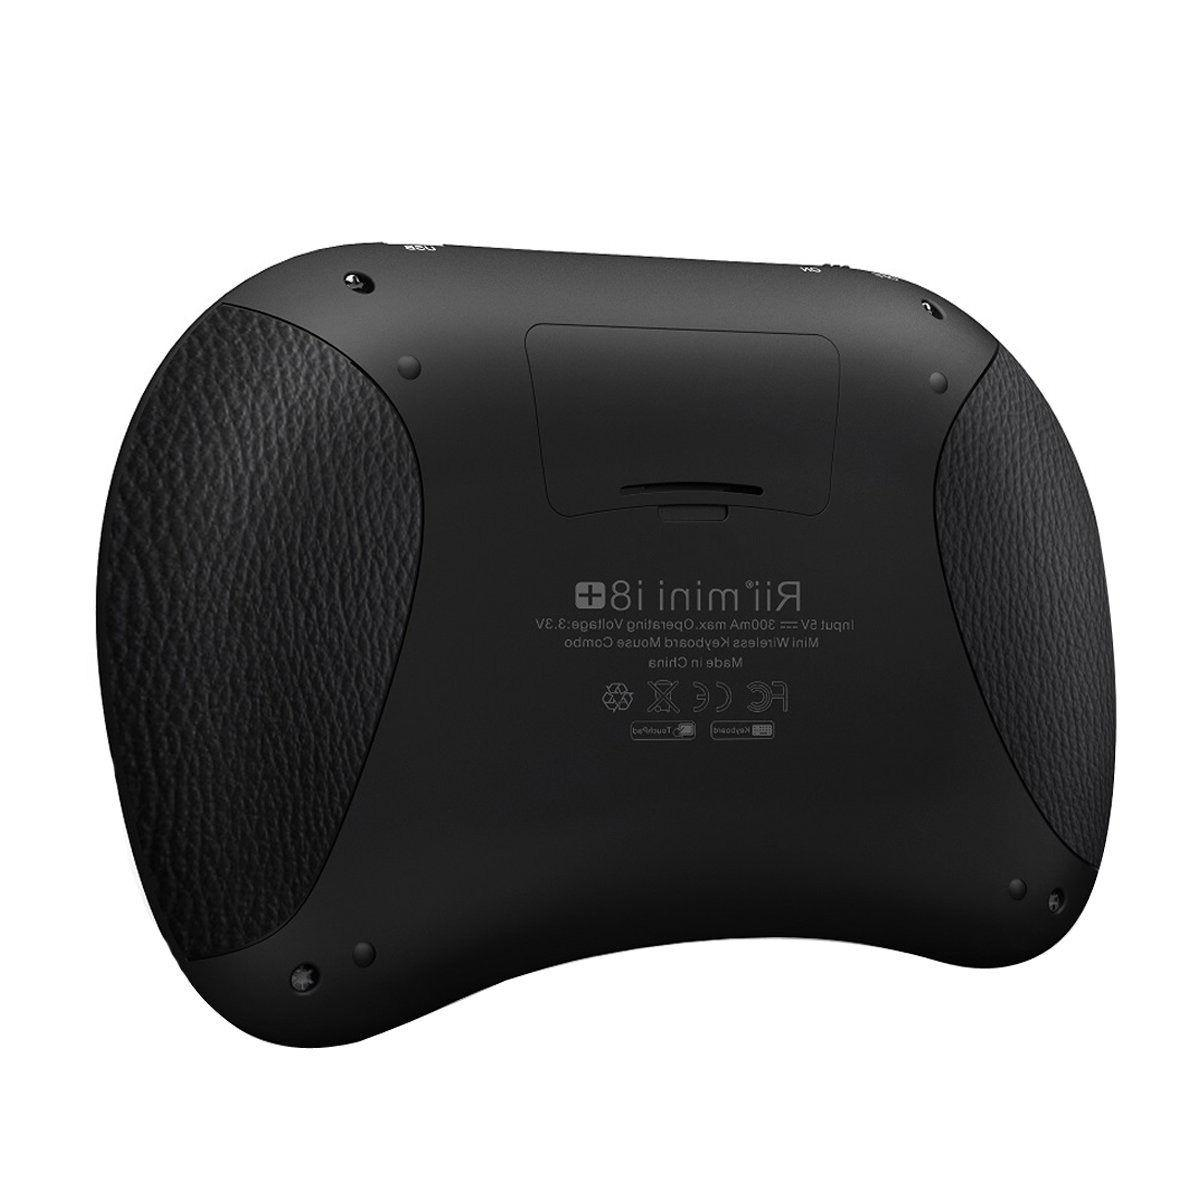 Rii Bluetooth Keyboard with Combo